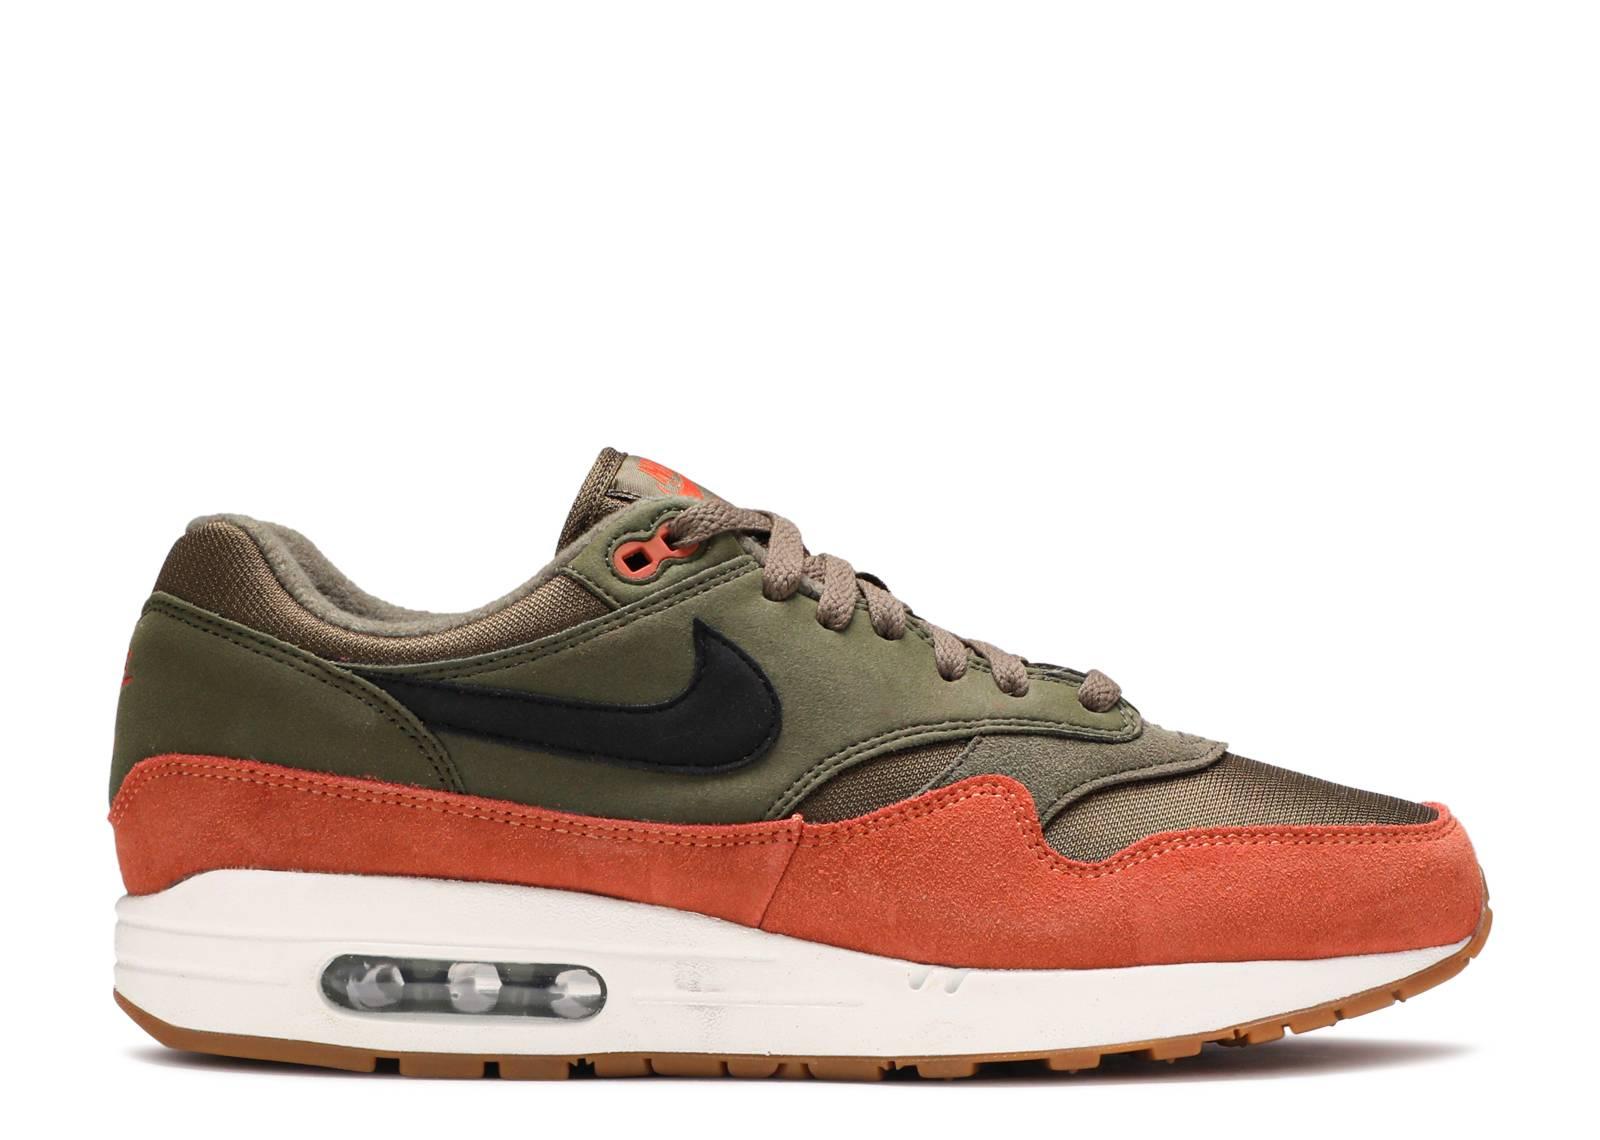 pretty nice 92684 4623d Nike Air Max 1 - Nike - ah8145 301 - olive canvasblack-dark